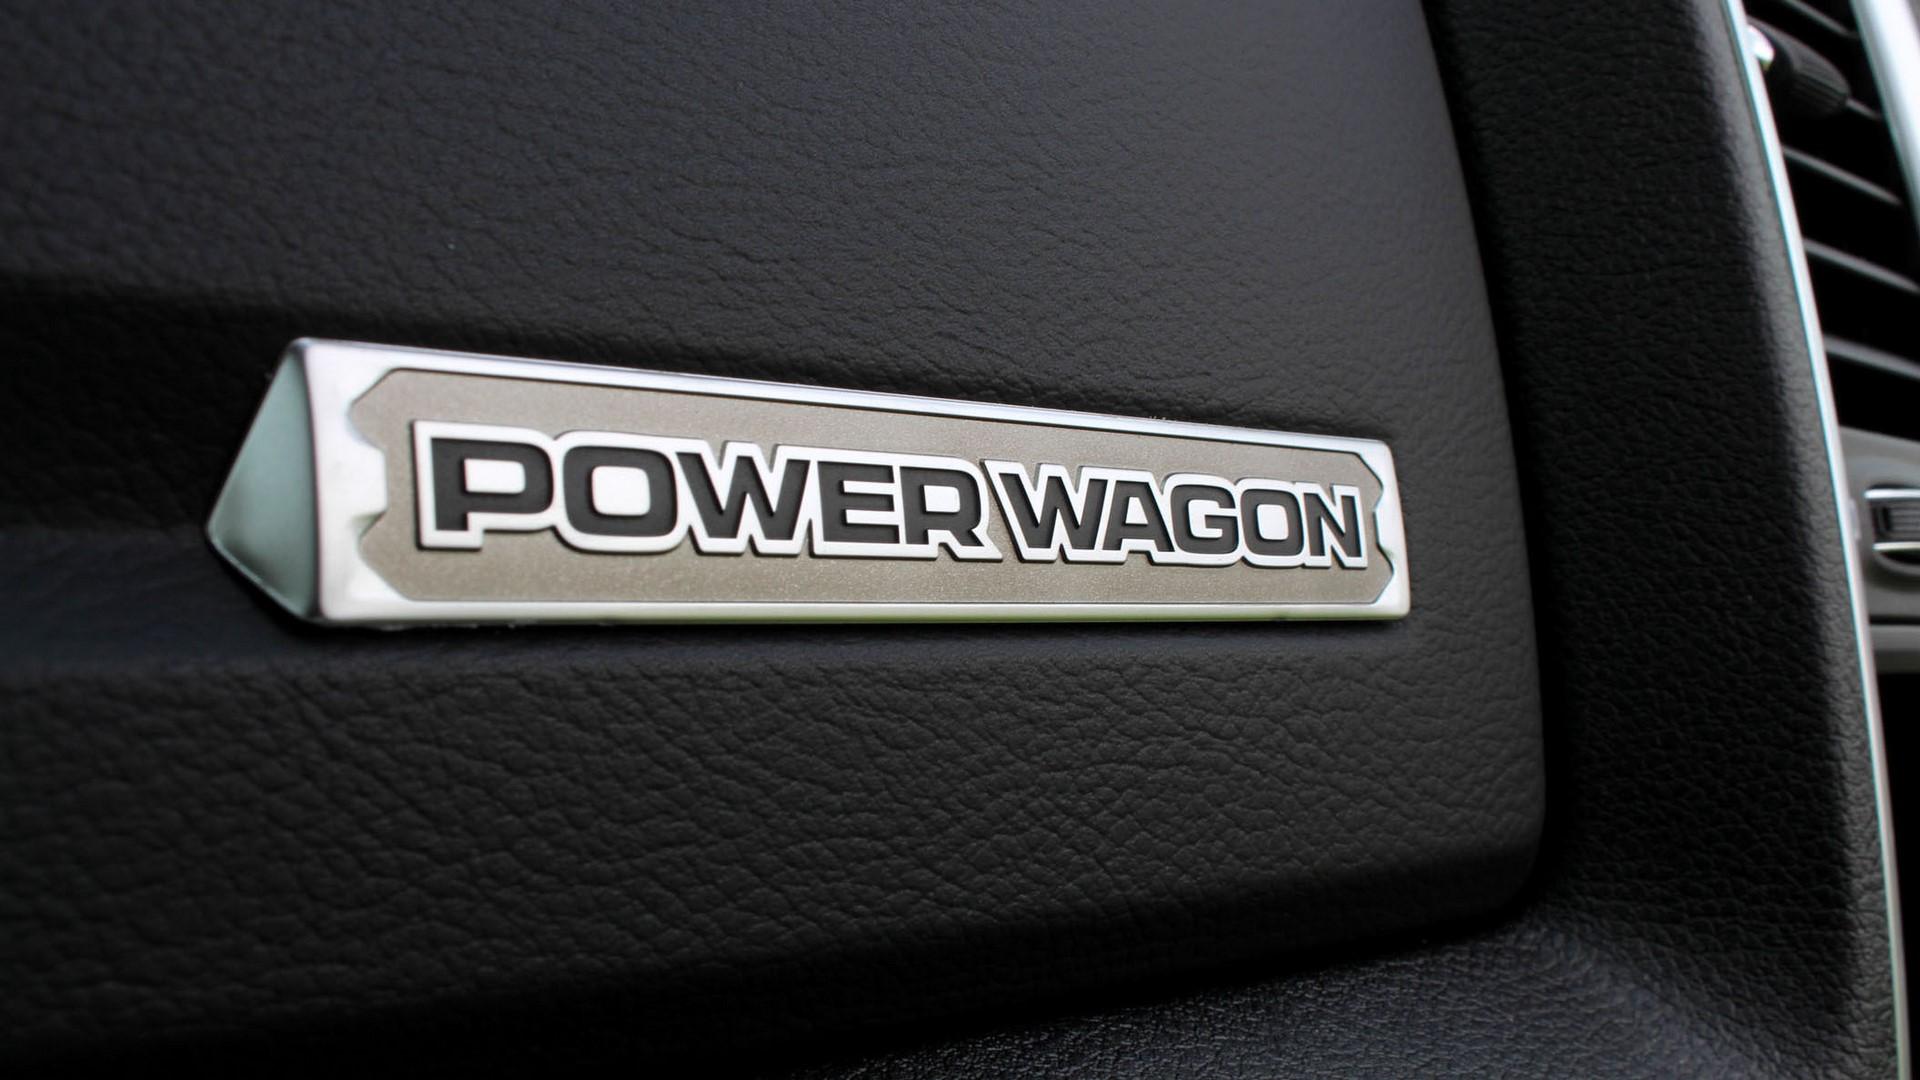 ram-2500-powerwagon-xtras-details-nameplate-2-1